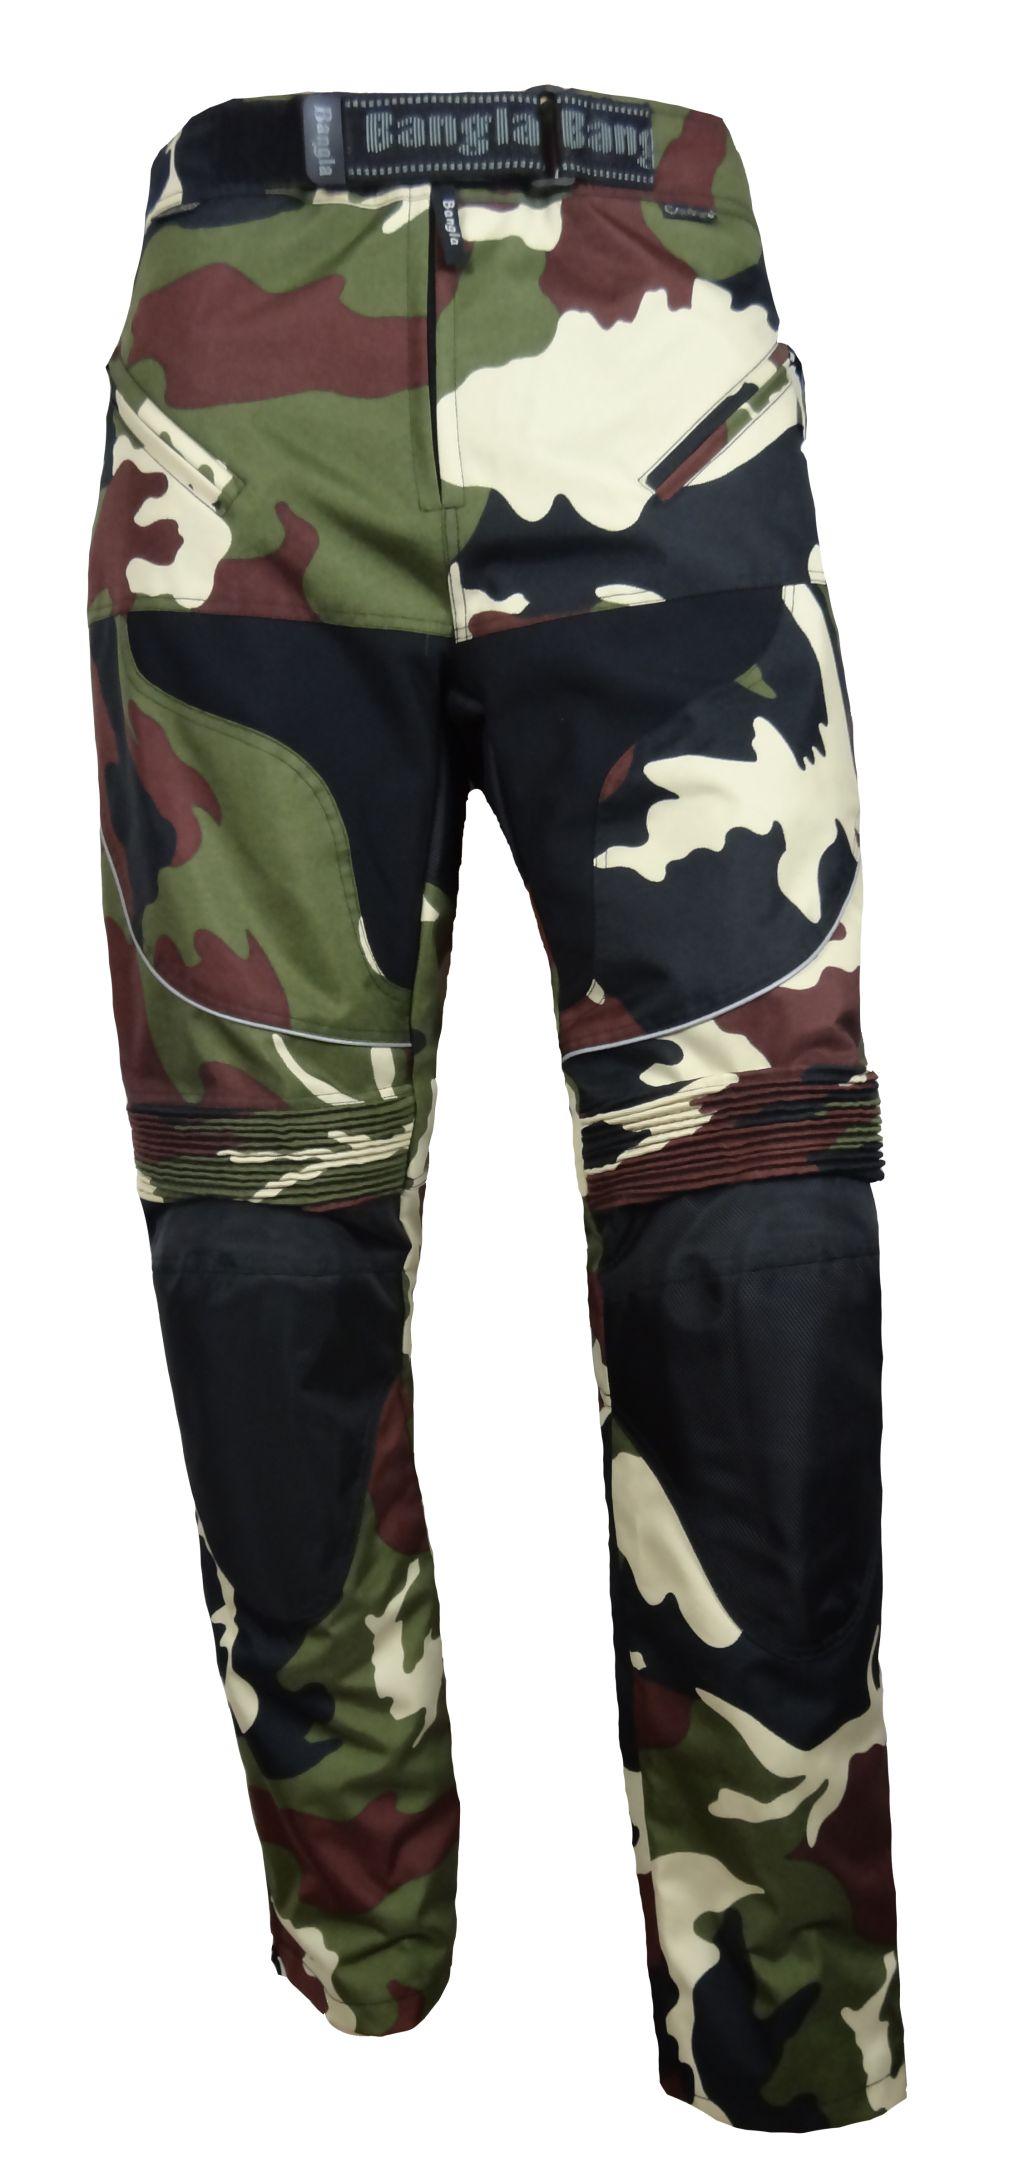 Motorradhose Herren Tourenhose Bangla Camouflage Gruen S bis 4 XL